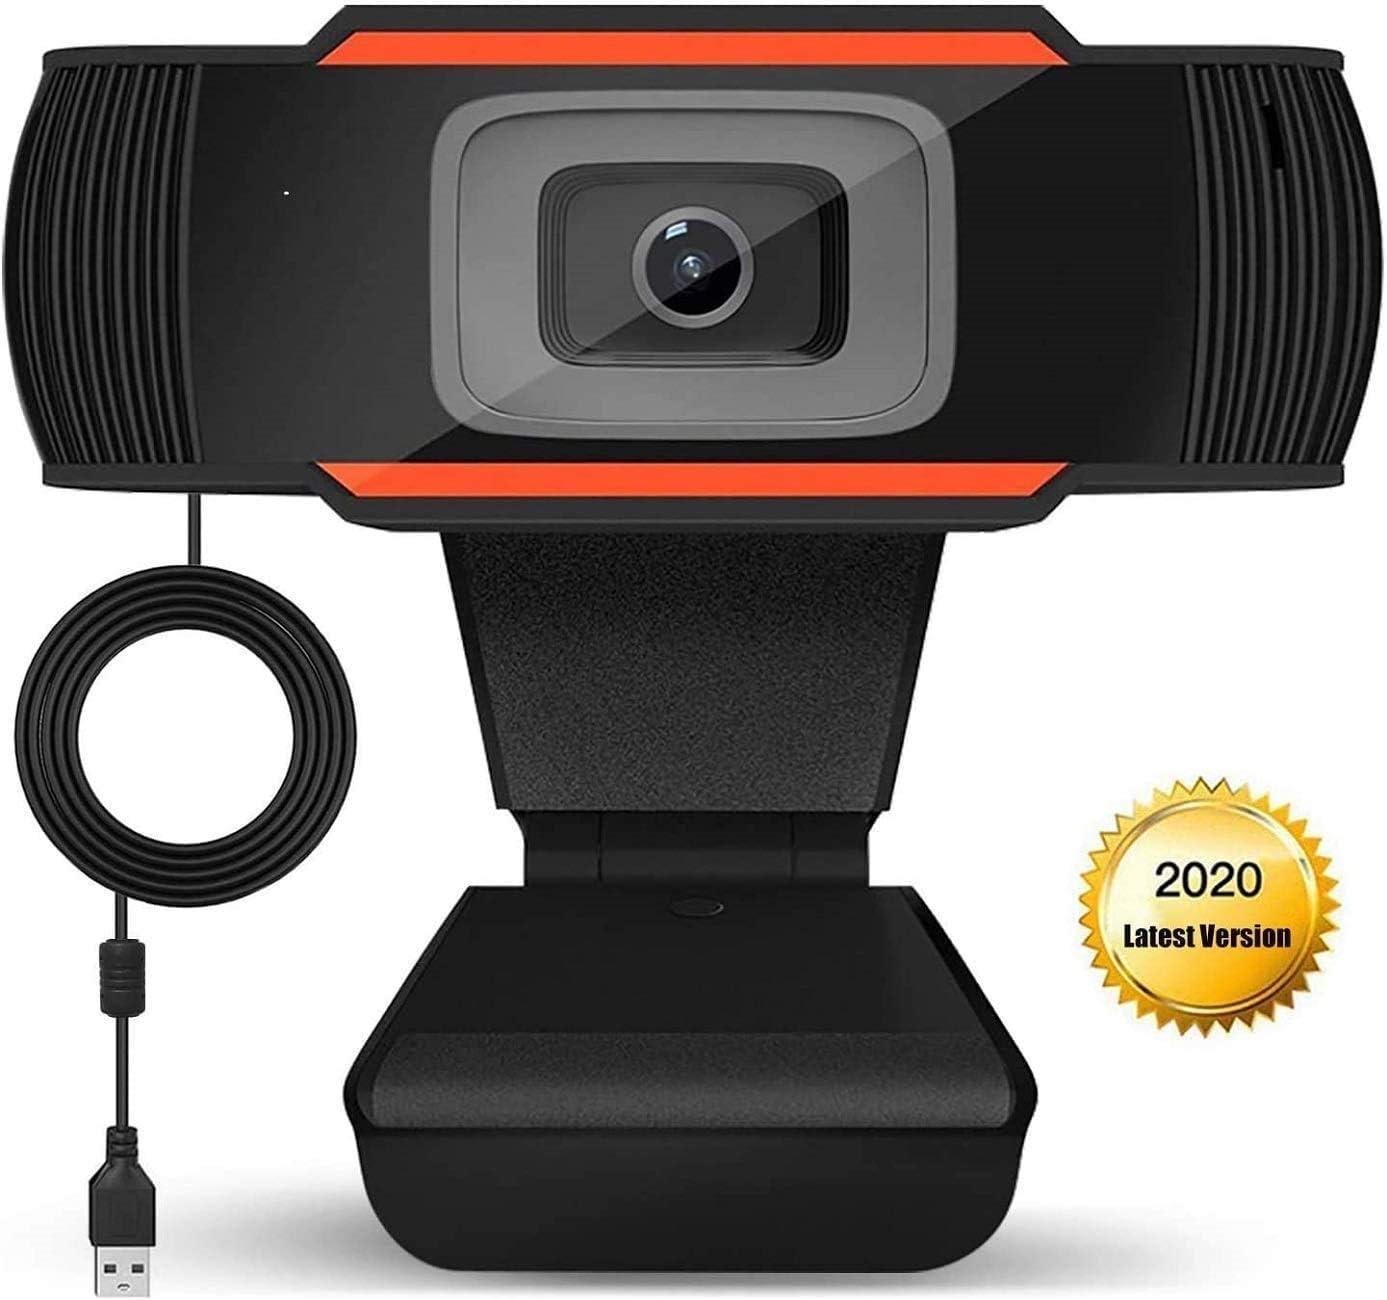 Webcam 1080P Dual Built-in Microphones PC Laptop Desktop USB Computer Camera for Video Calling Recording Conference Study Skype